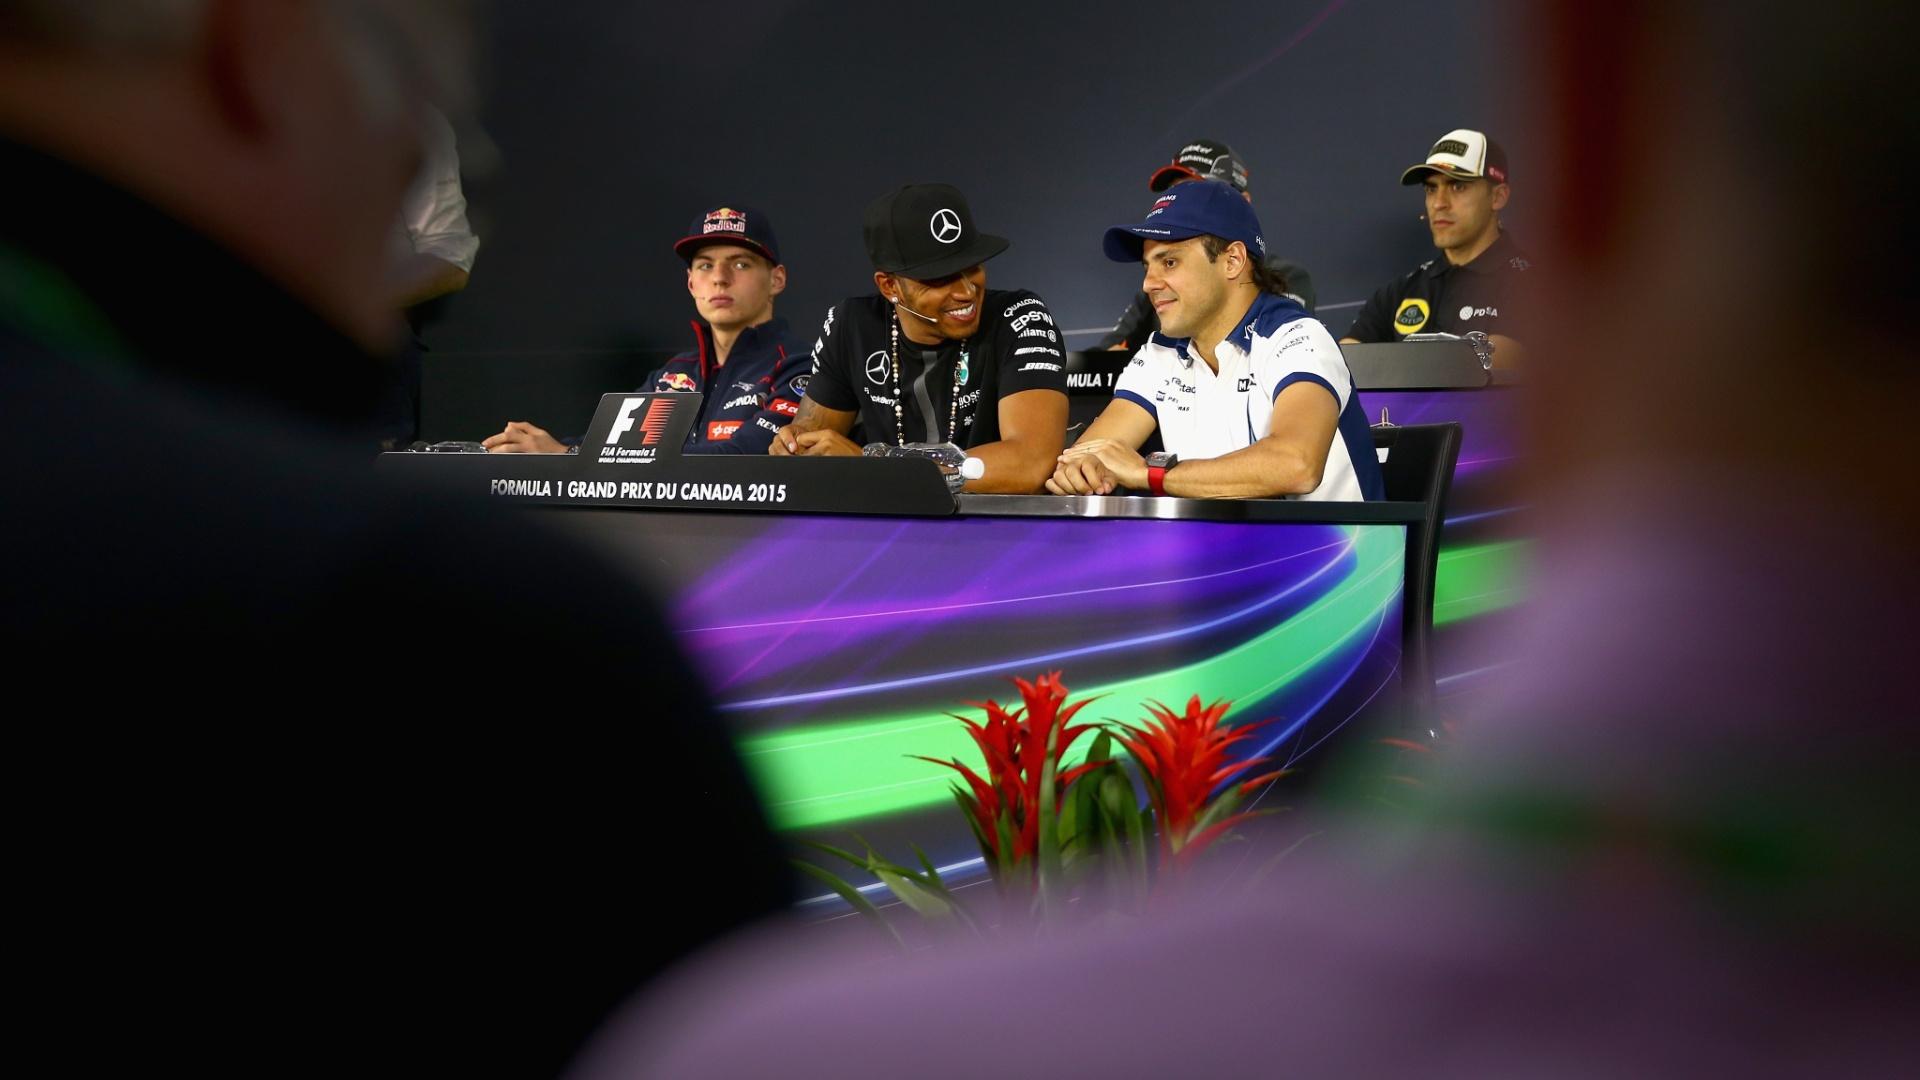 04.jun.2015 - Max Verstappen (e), Lewis Hamilton (c) e Felipe Massa (d) participam de entrevista coletiva prévia ao GP do Canadá